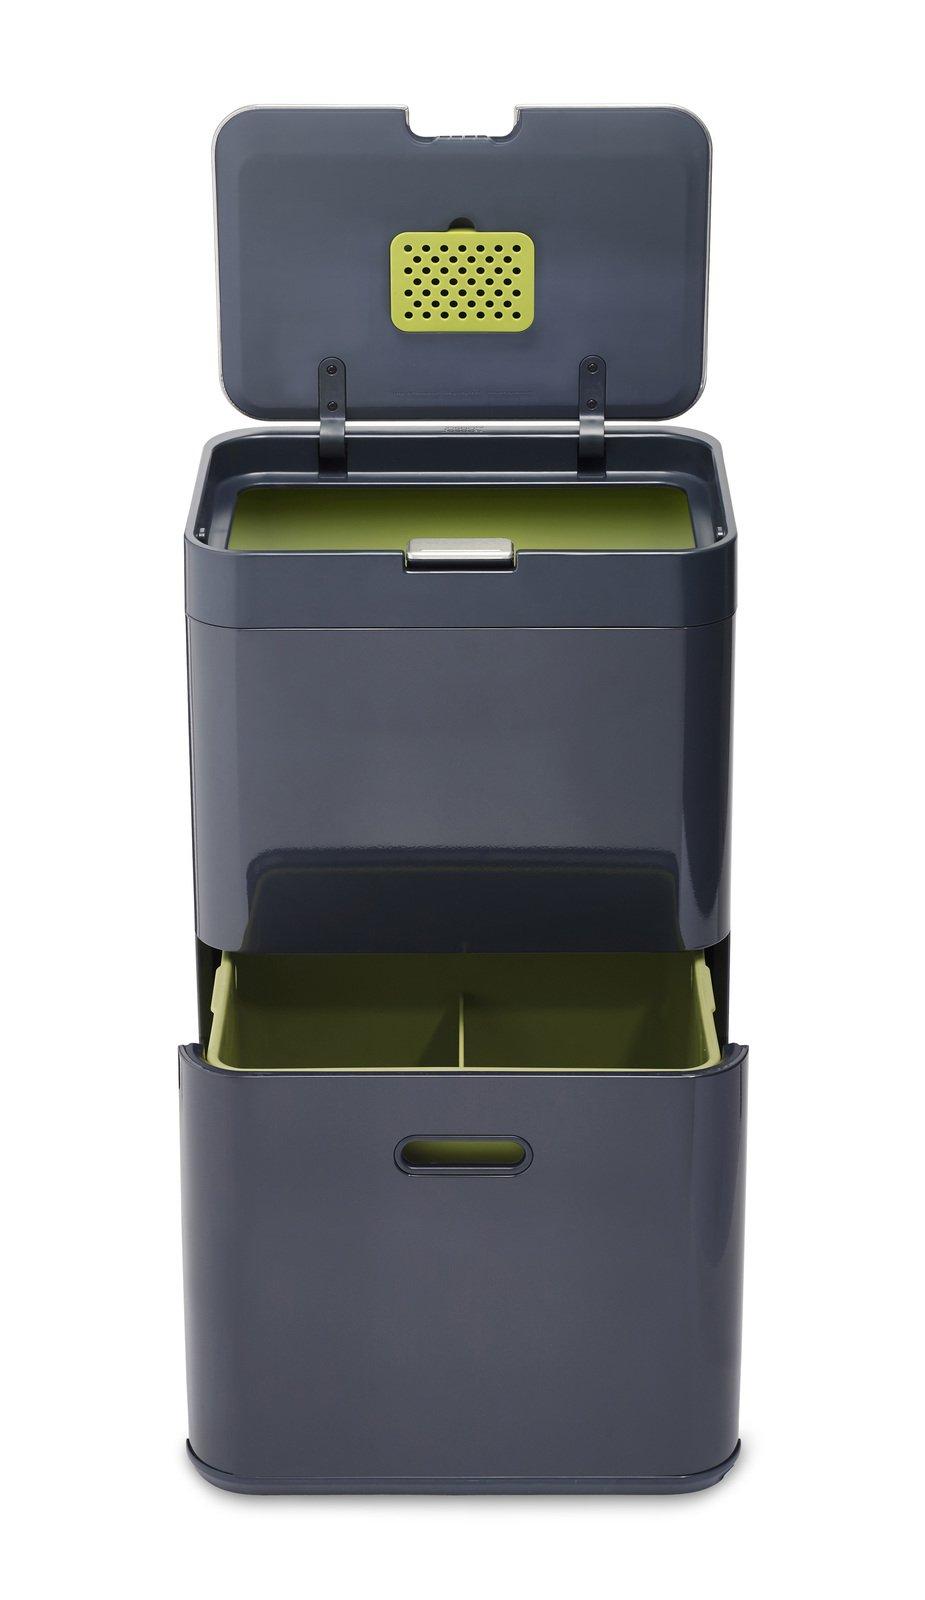 Joseph-Joseph-Intelligent-Waste-Totem-Bin-Separation-and-Recycling-Unit